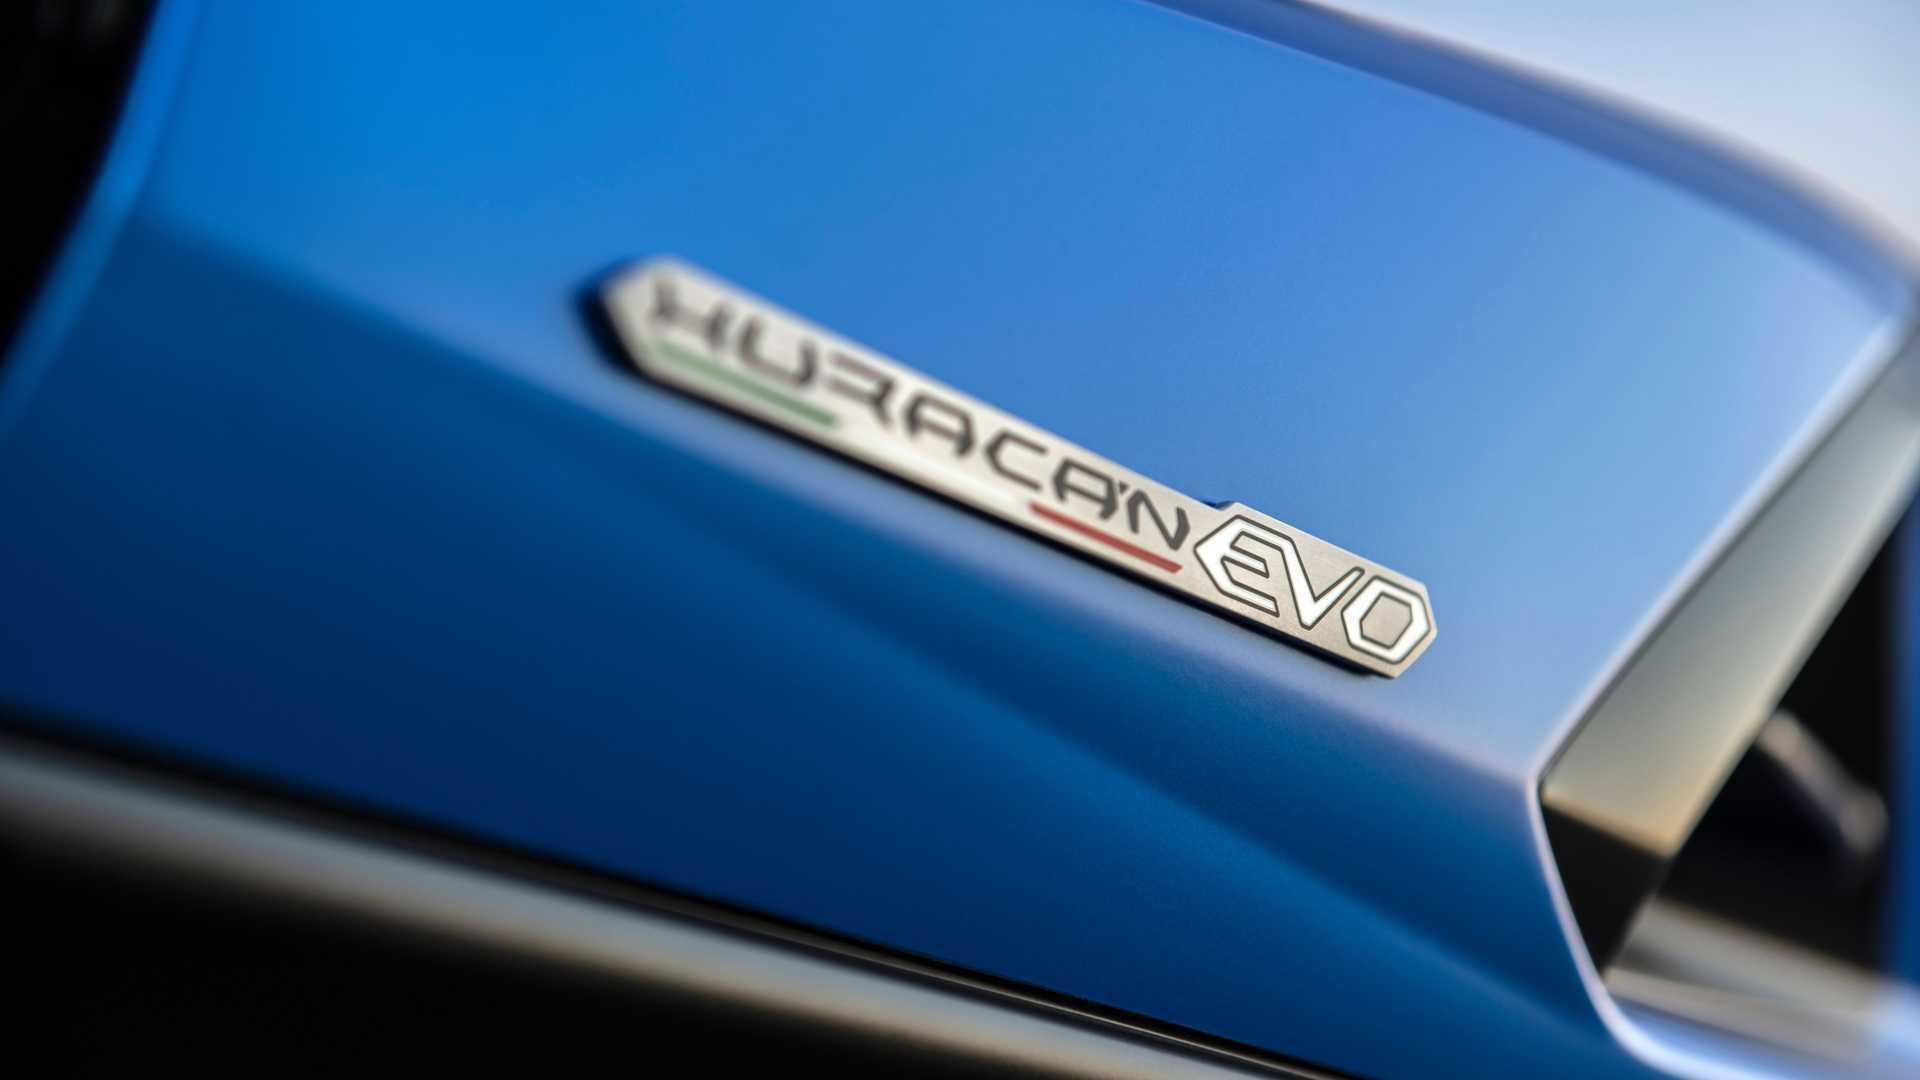 2020 Lamborghini Huracan Evo RWD badge detail